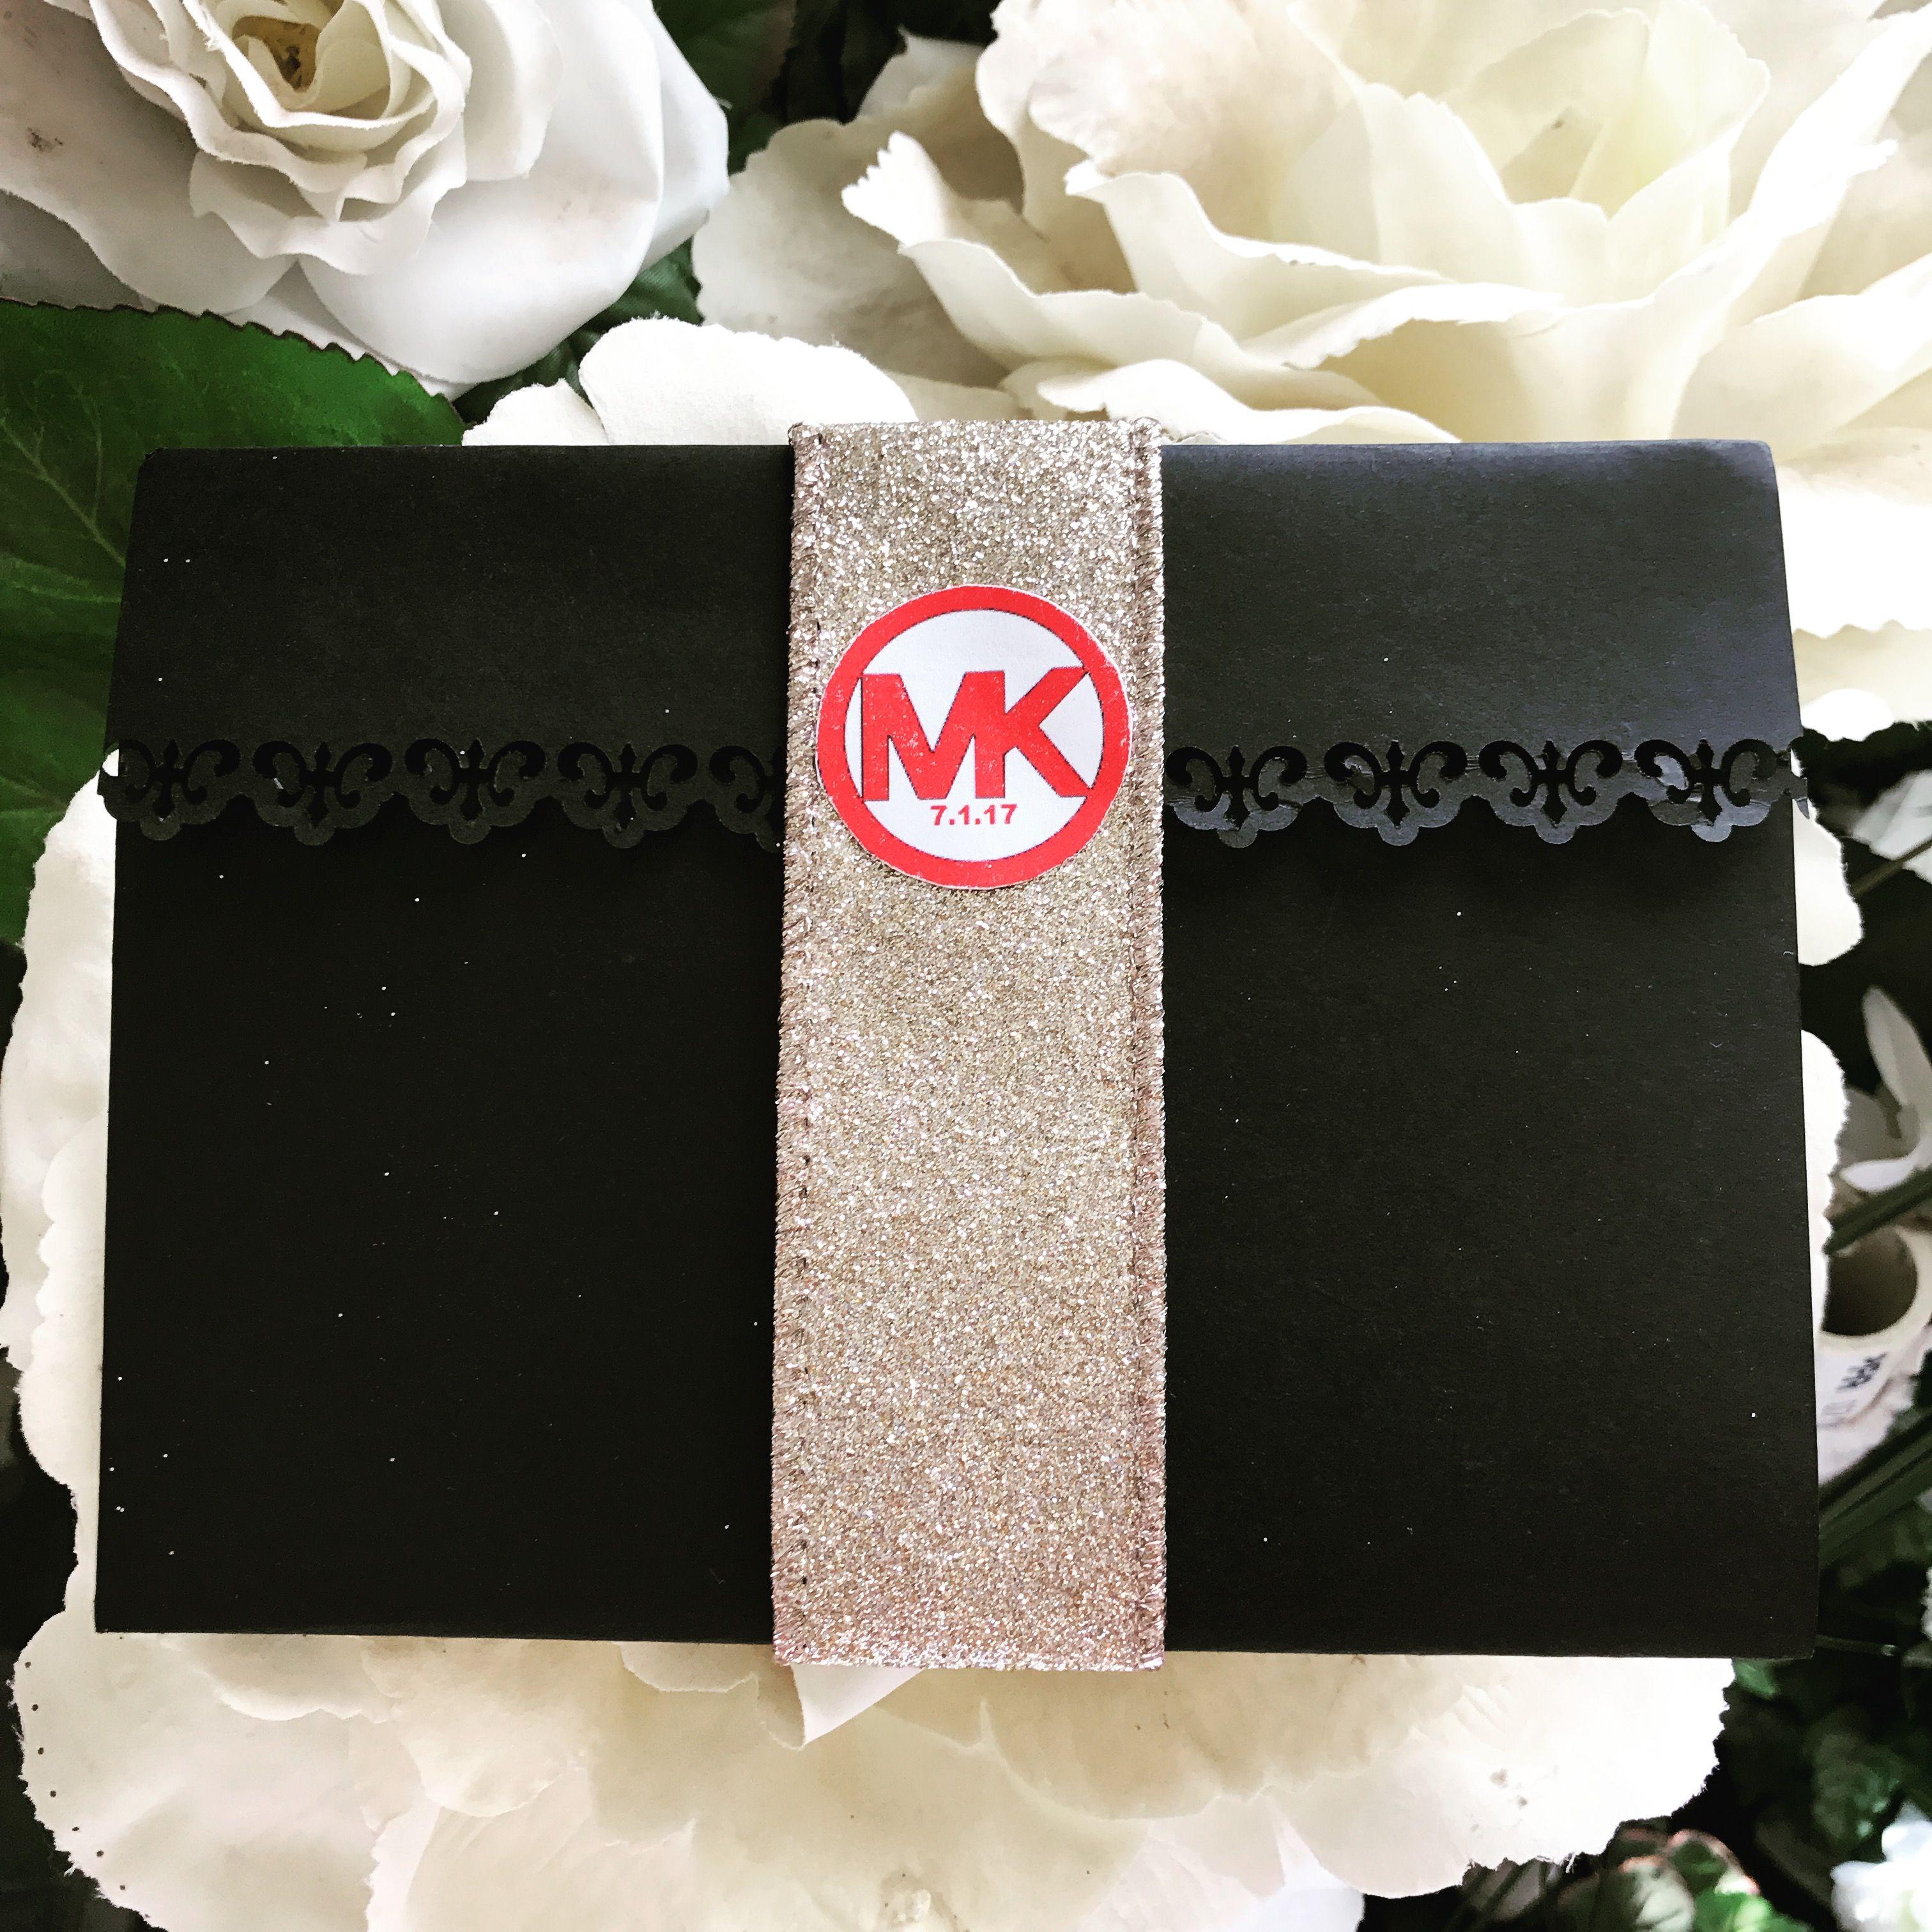 My wedding invitation i love michael kors our initials are matt